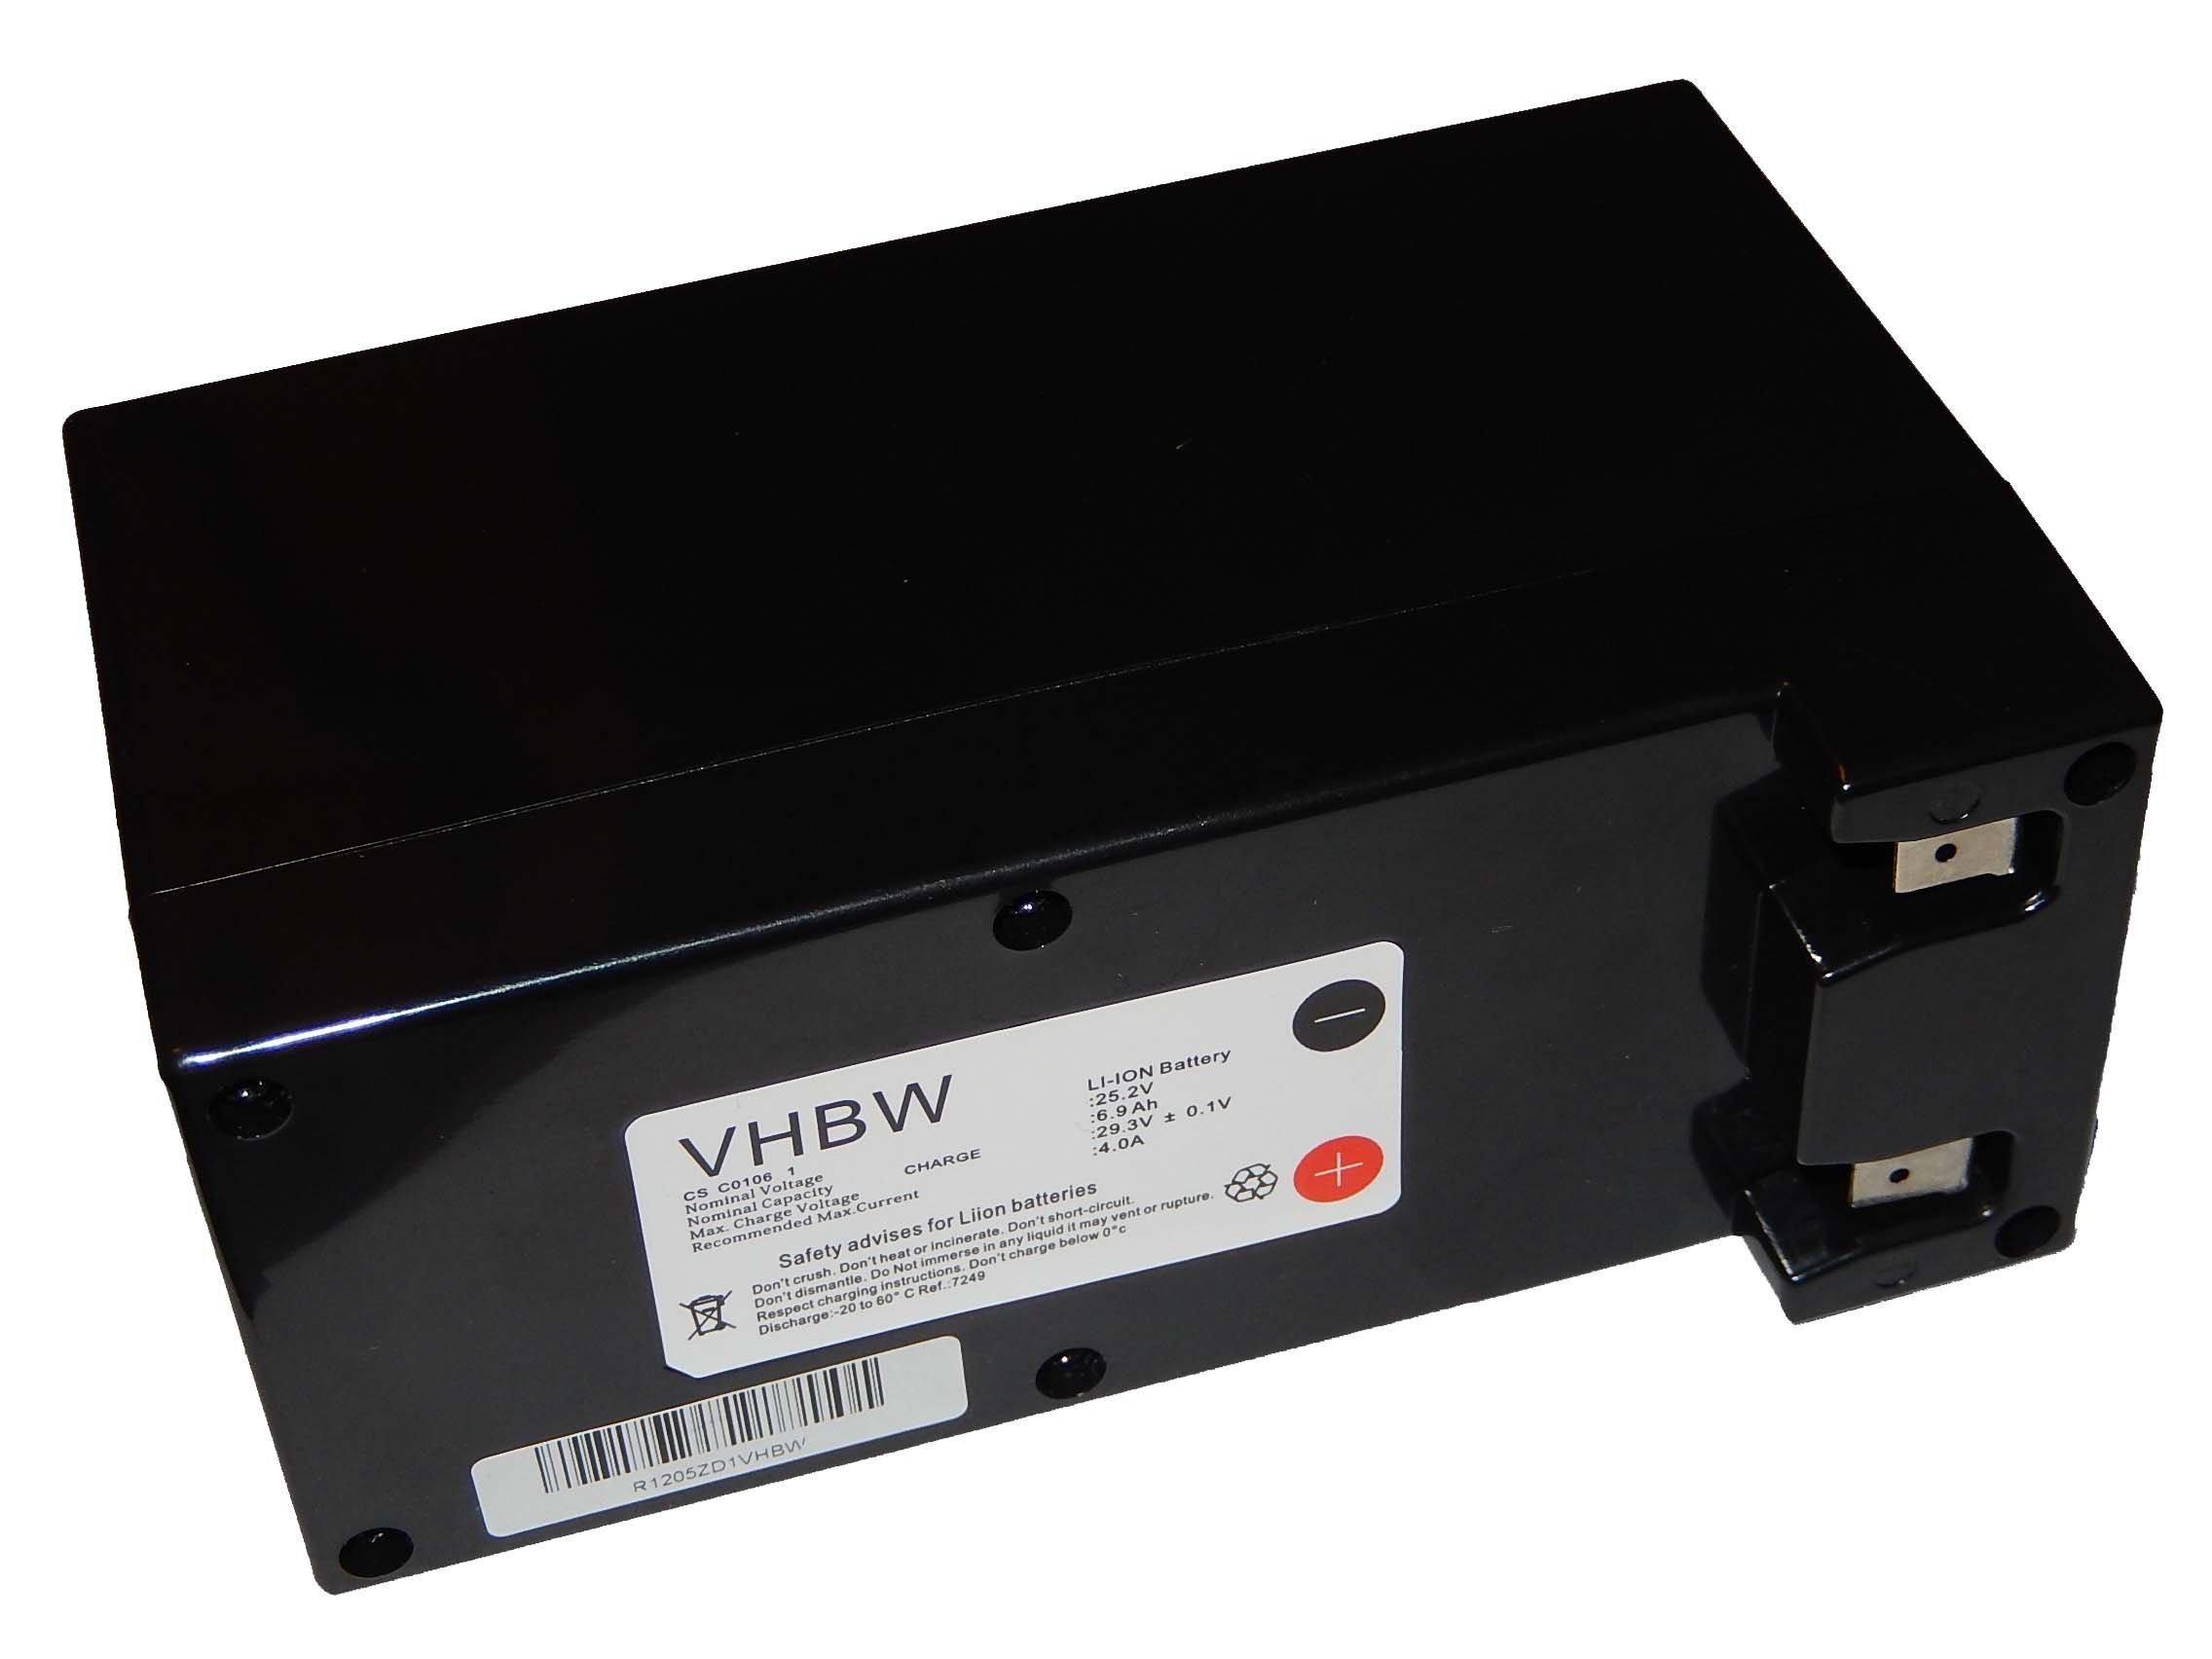 para Robot cortac/ésped Ambrogio L200 Deluxe 1B 25.2V L200 Deluxe 2B reemplaza Zucchetti CS-C0106-1. vhbw Bater/ía Li-Ion 6900mAh